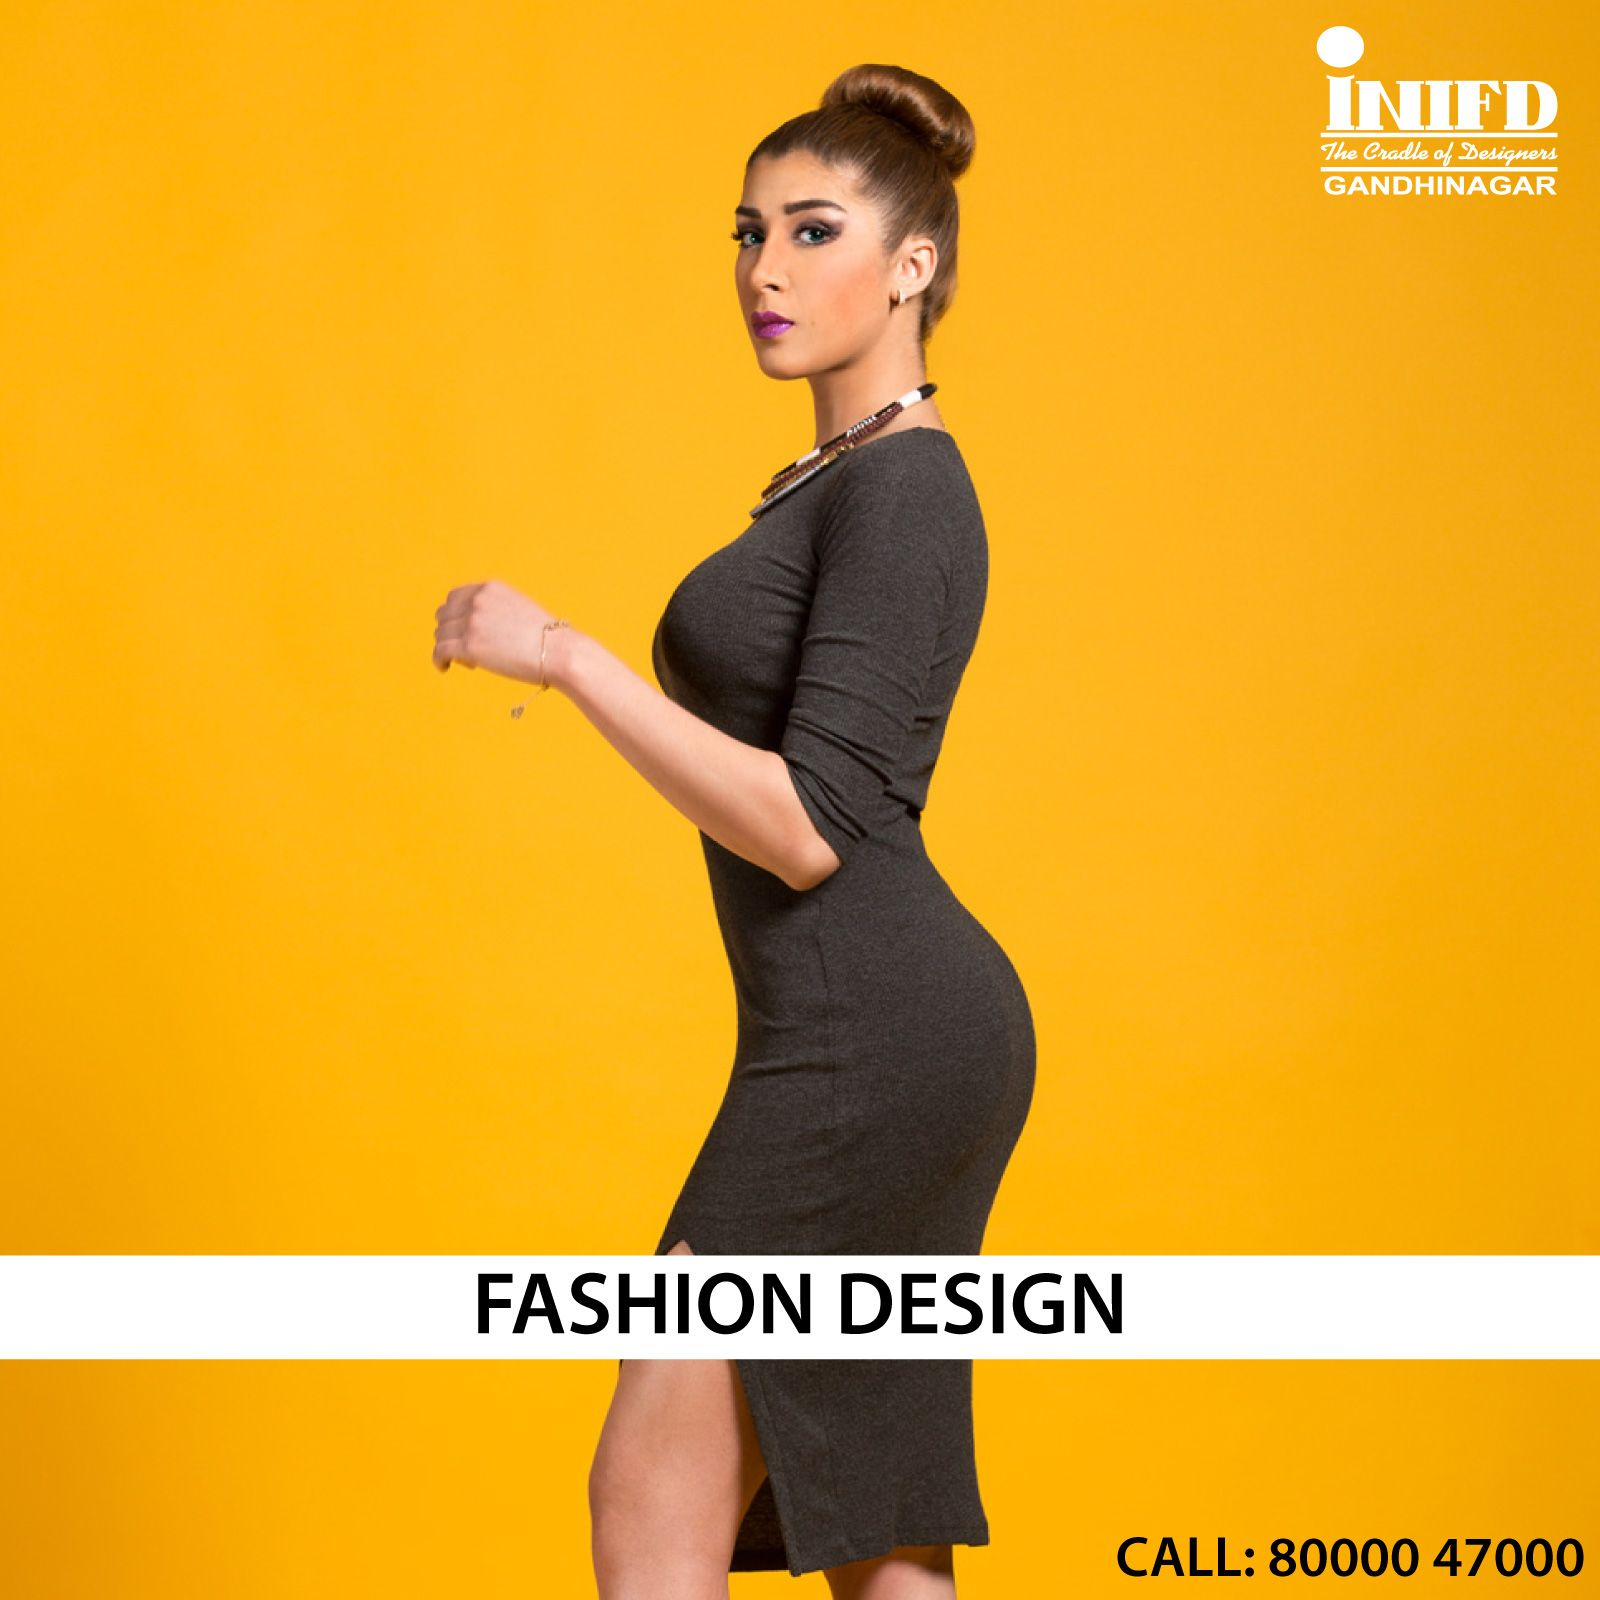 Best Fashion Interior Design Institute Inifd Gandhinagar Fashion Designing Course Fashion Courses Fashion